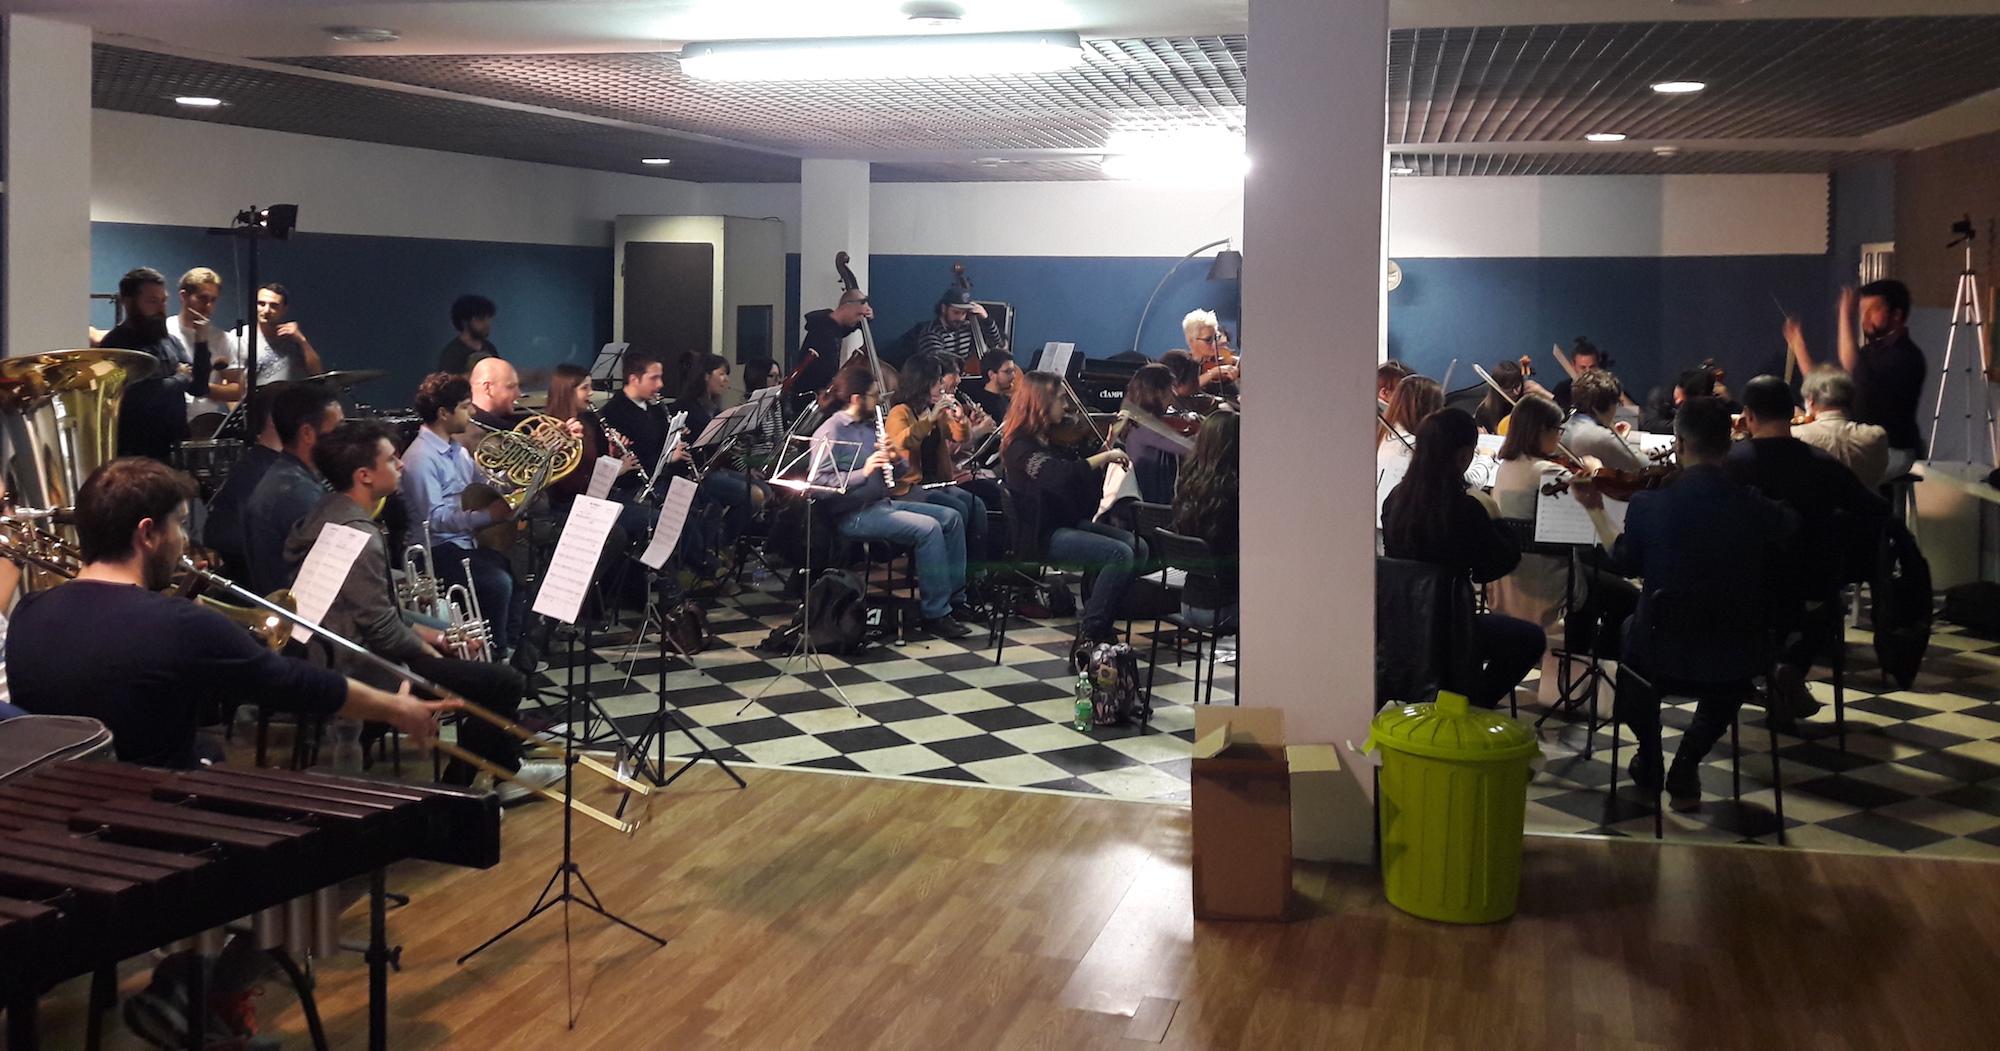 Player 2 Orchestra, l'orchestra sinfonica dedicata alle colonne sonore nerd